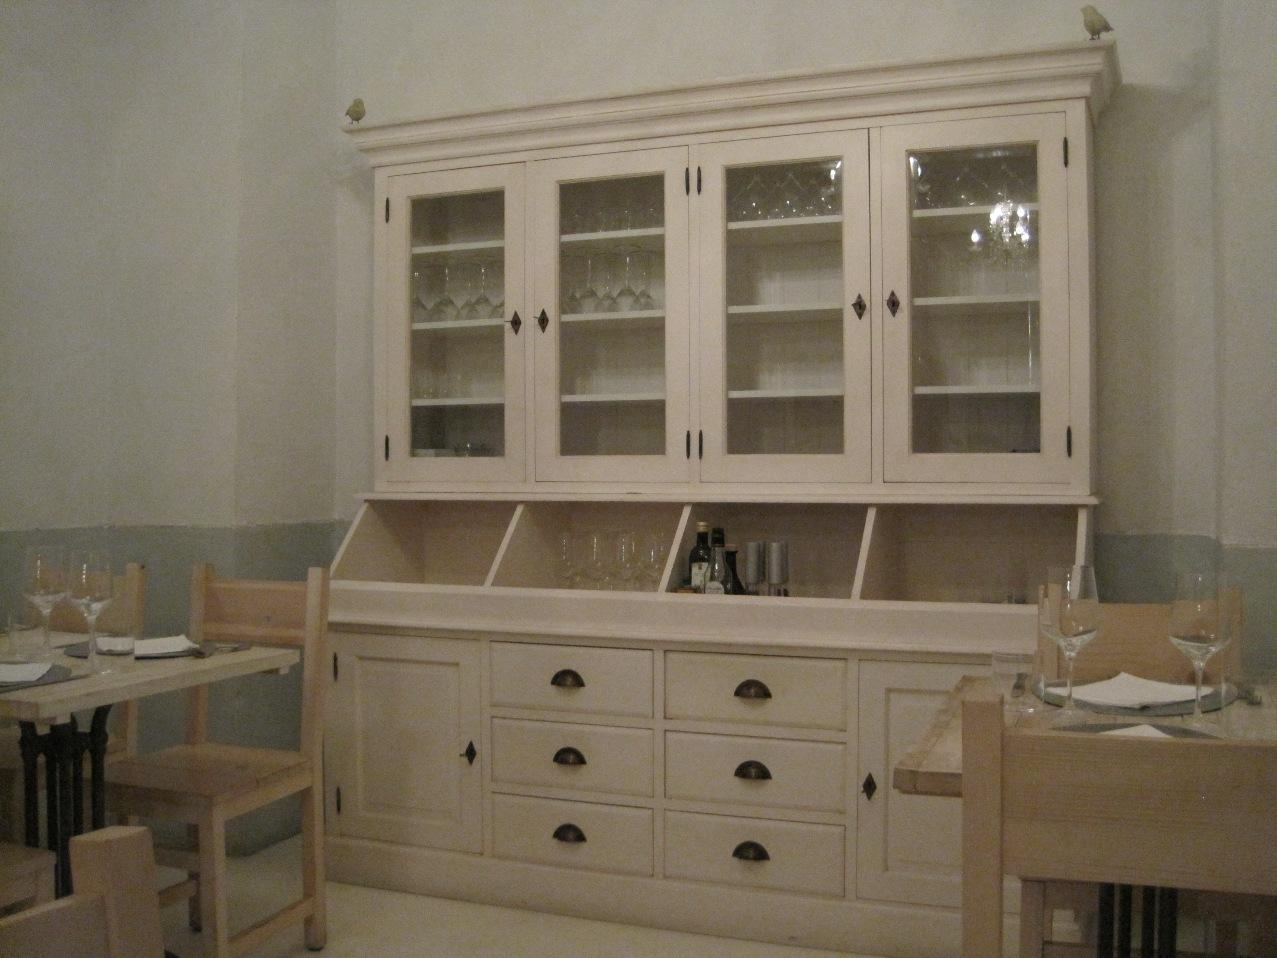 La Credenza Cucina : Ikea credenze per cucina e buffet images